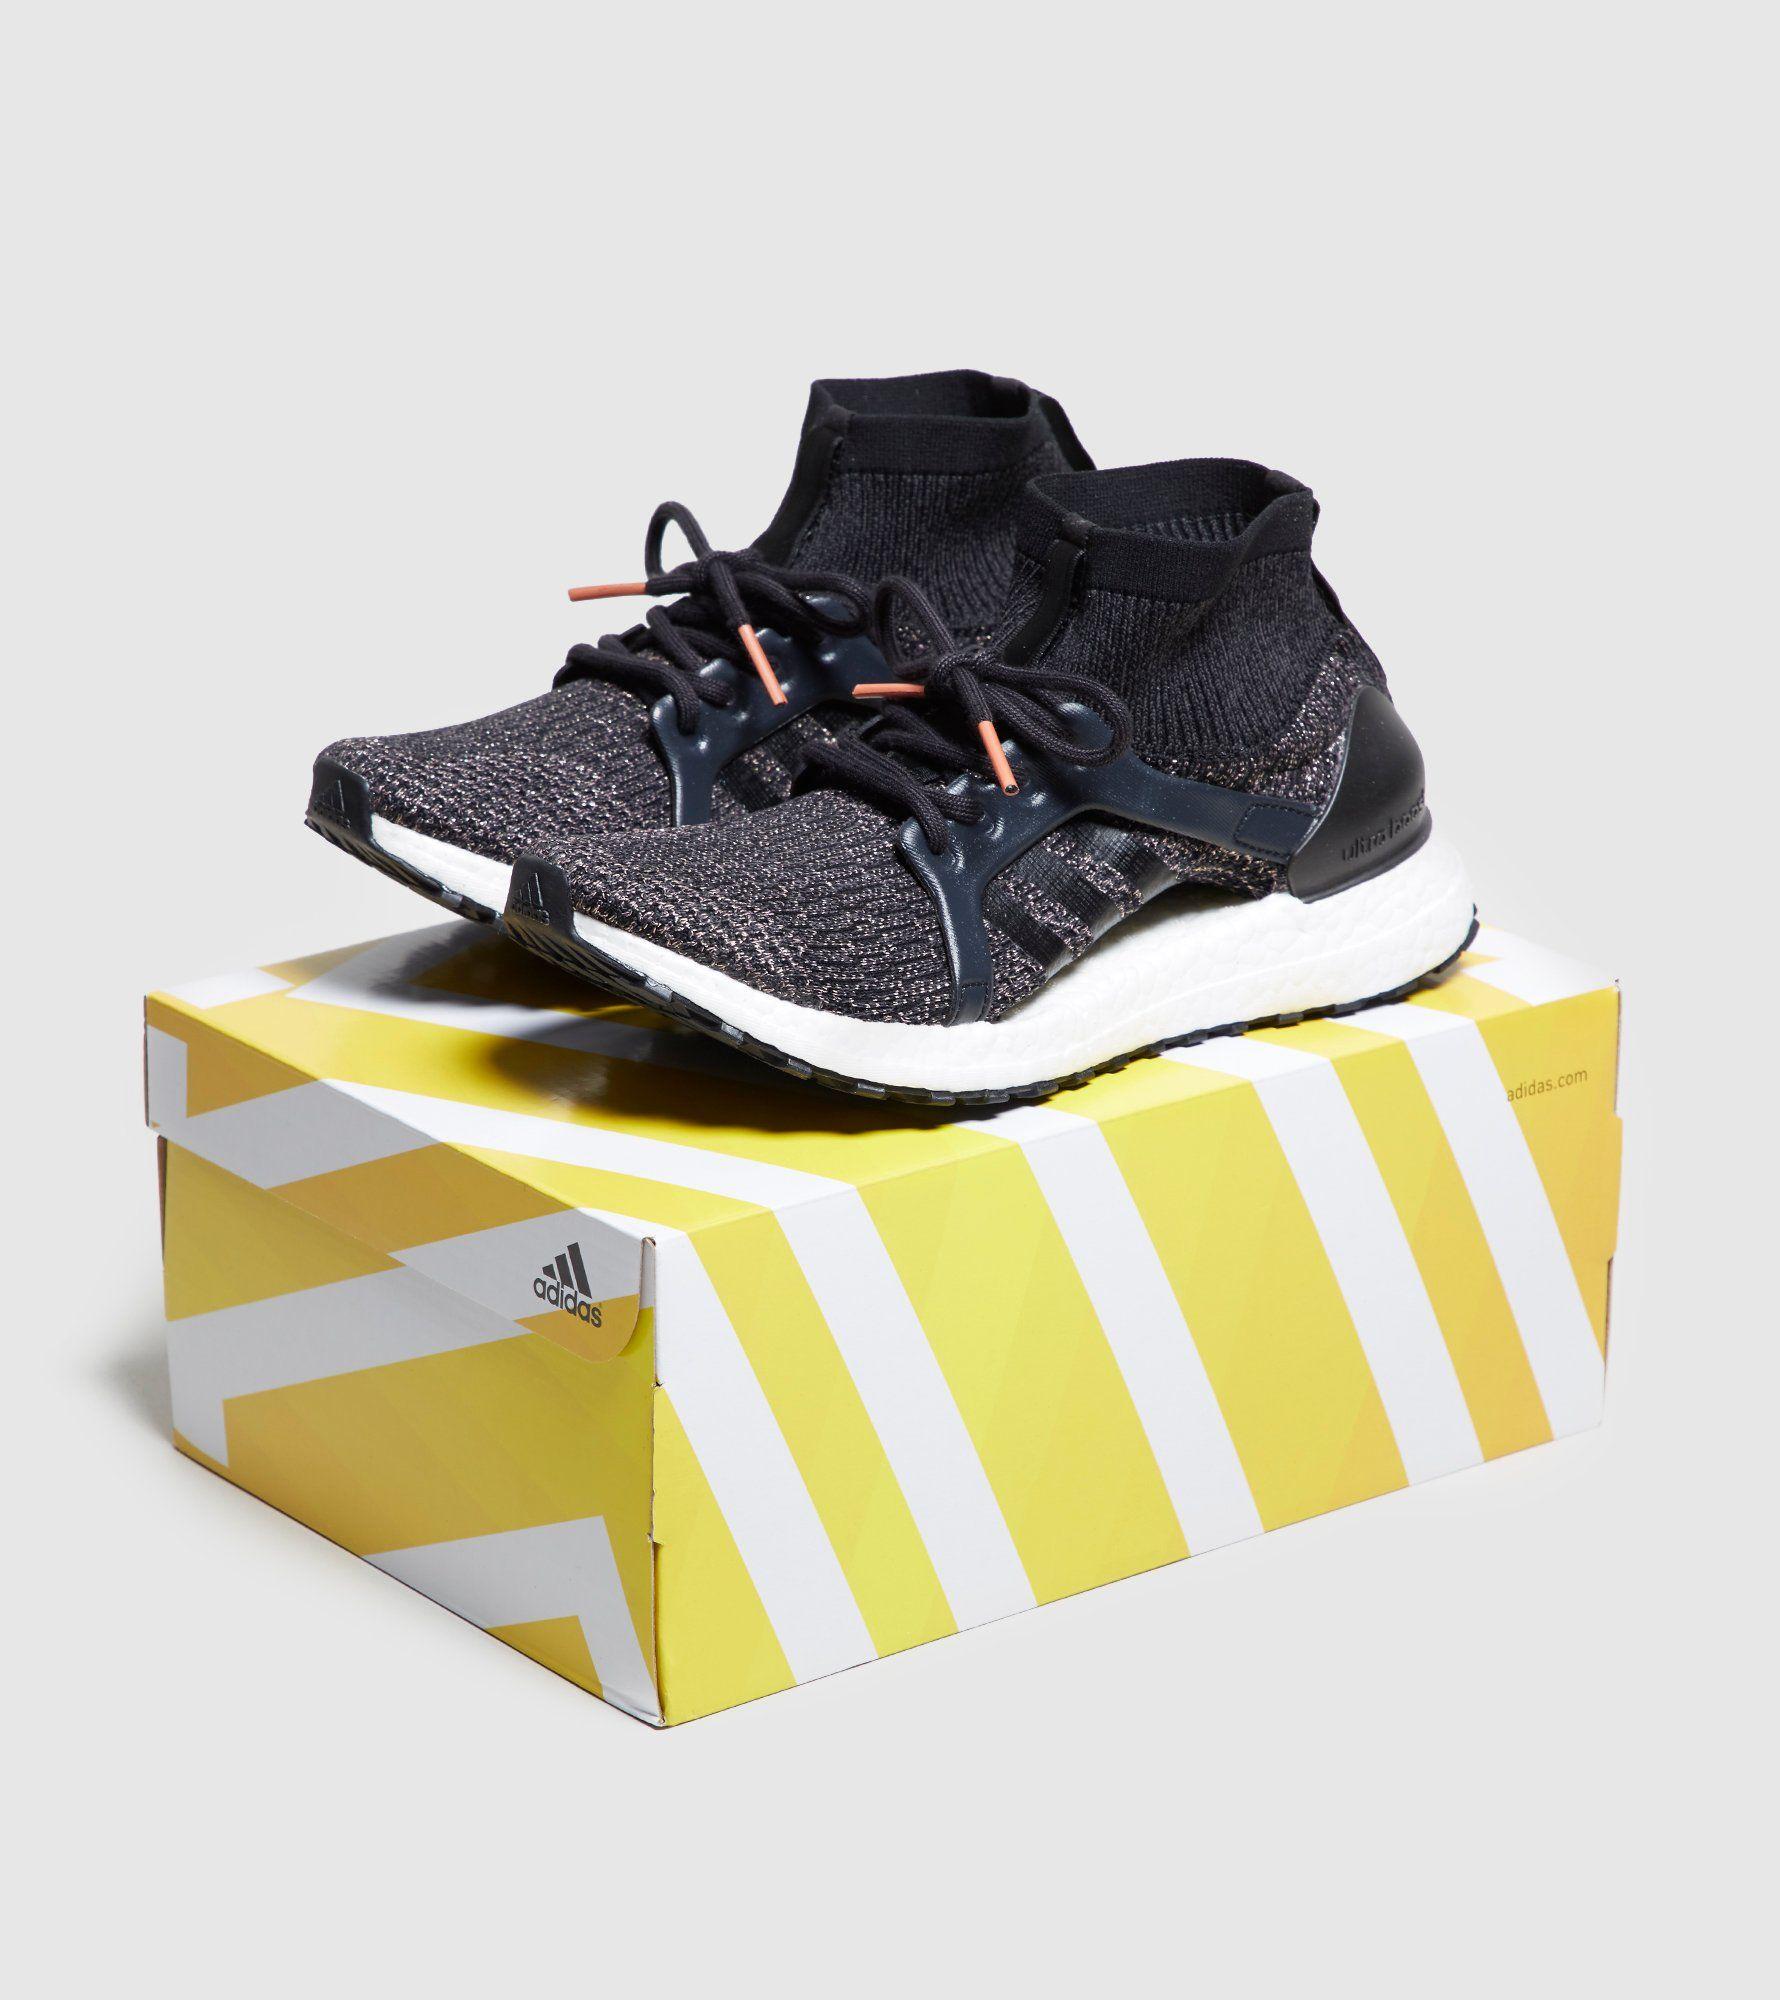 bdf7006817d179 germany adidas pure boost all terrain womens orange black 839f5 2786d